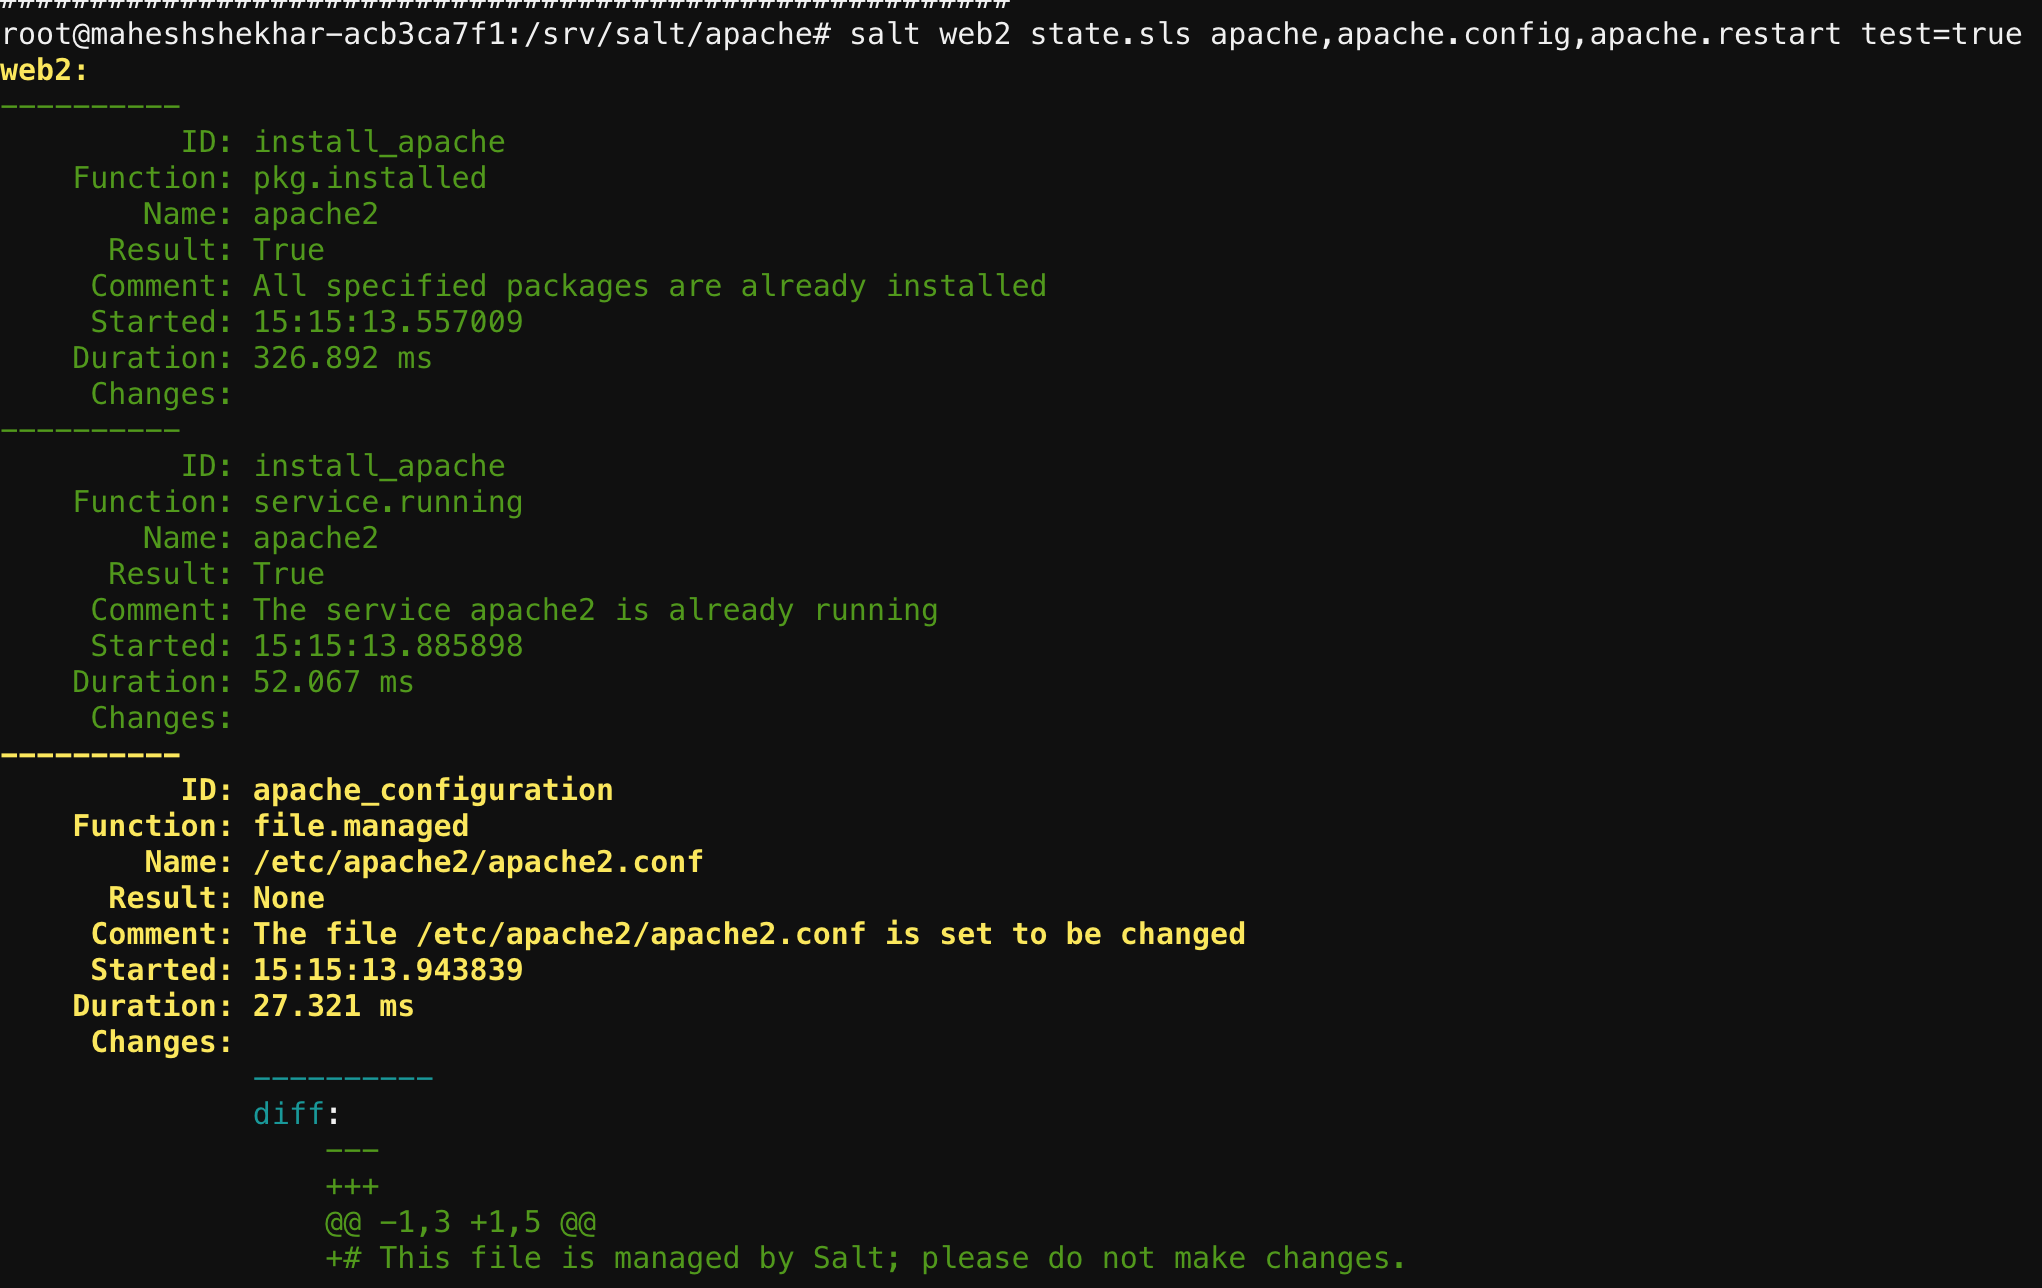 SaltStack - Apache Formula for Debian OS Family - DZone Open